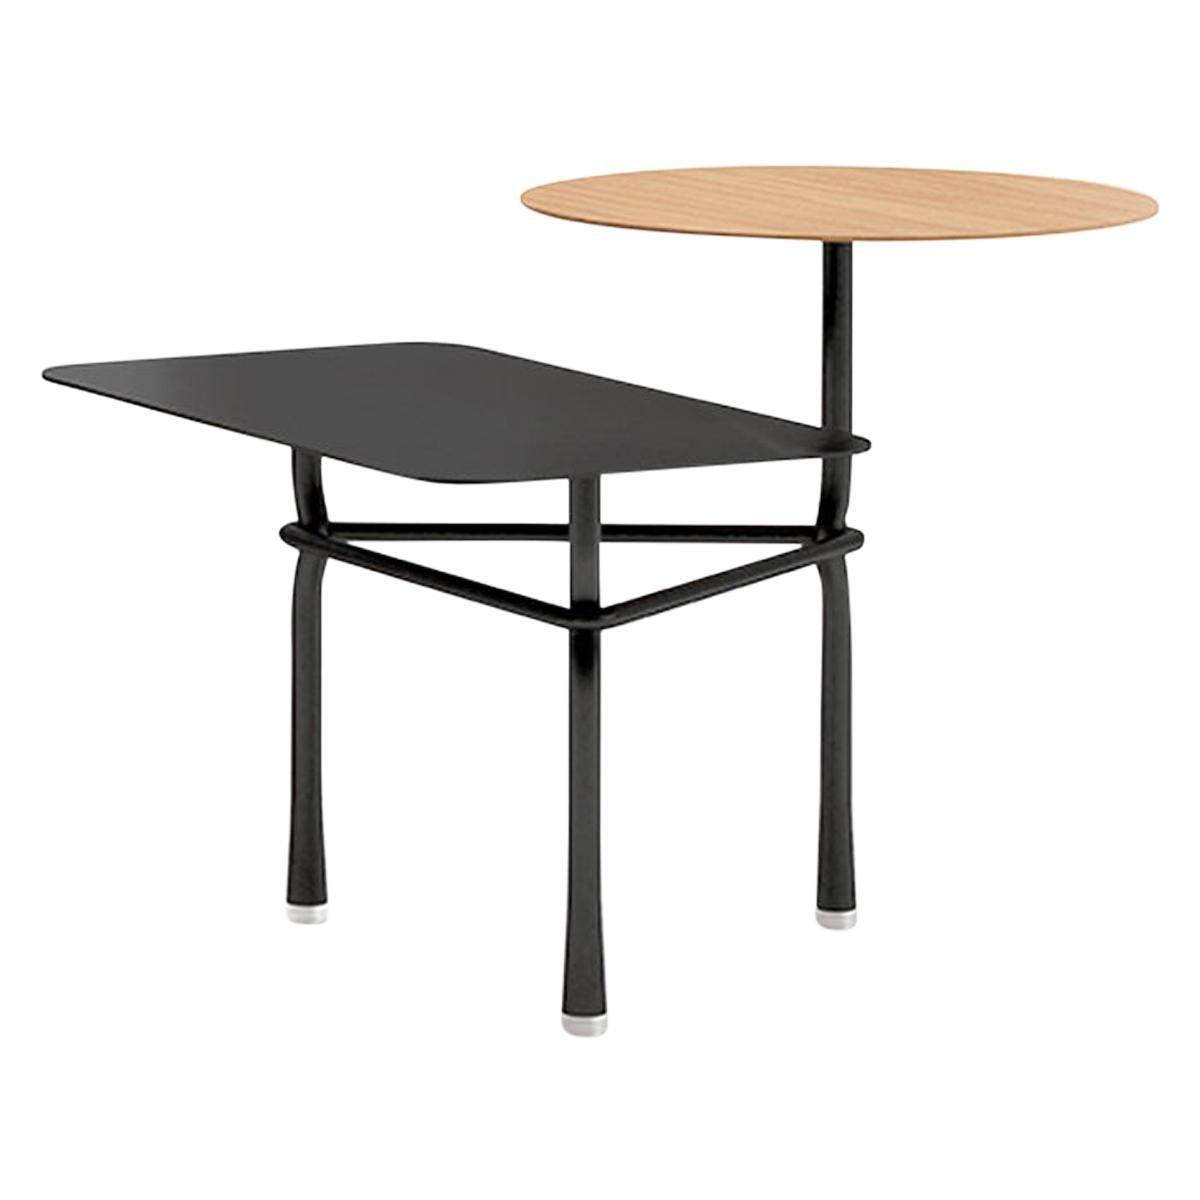 Tiers Table, Matt Oak and Black Finish by Patricia Urquiola